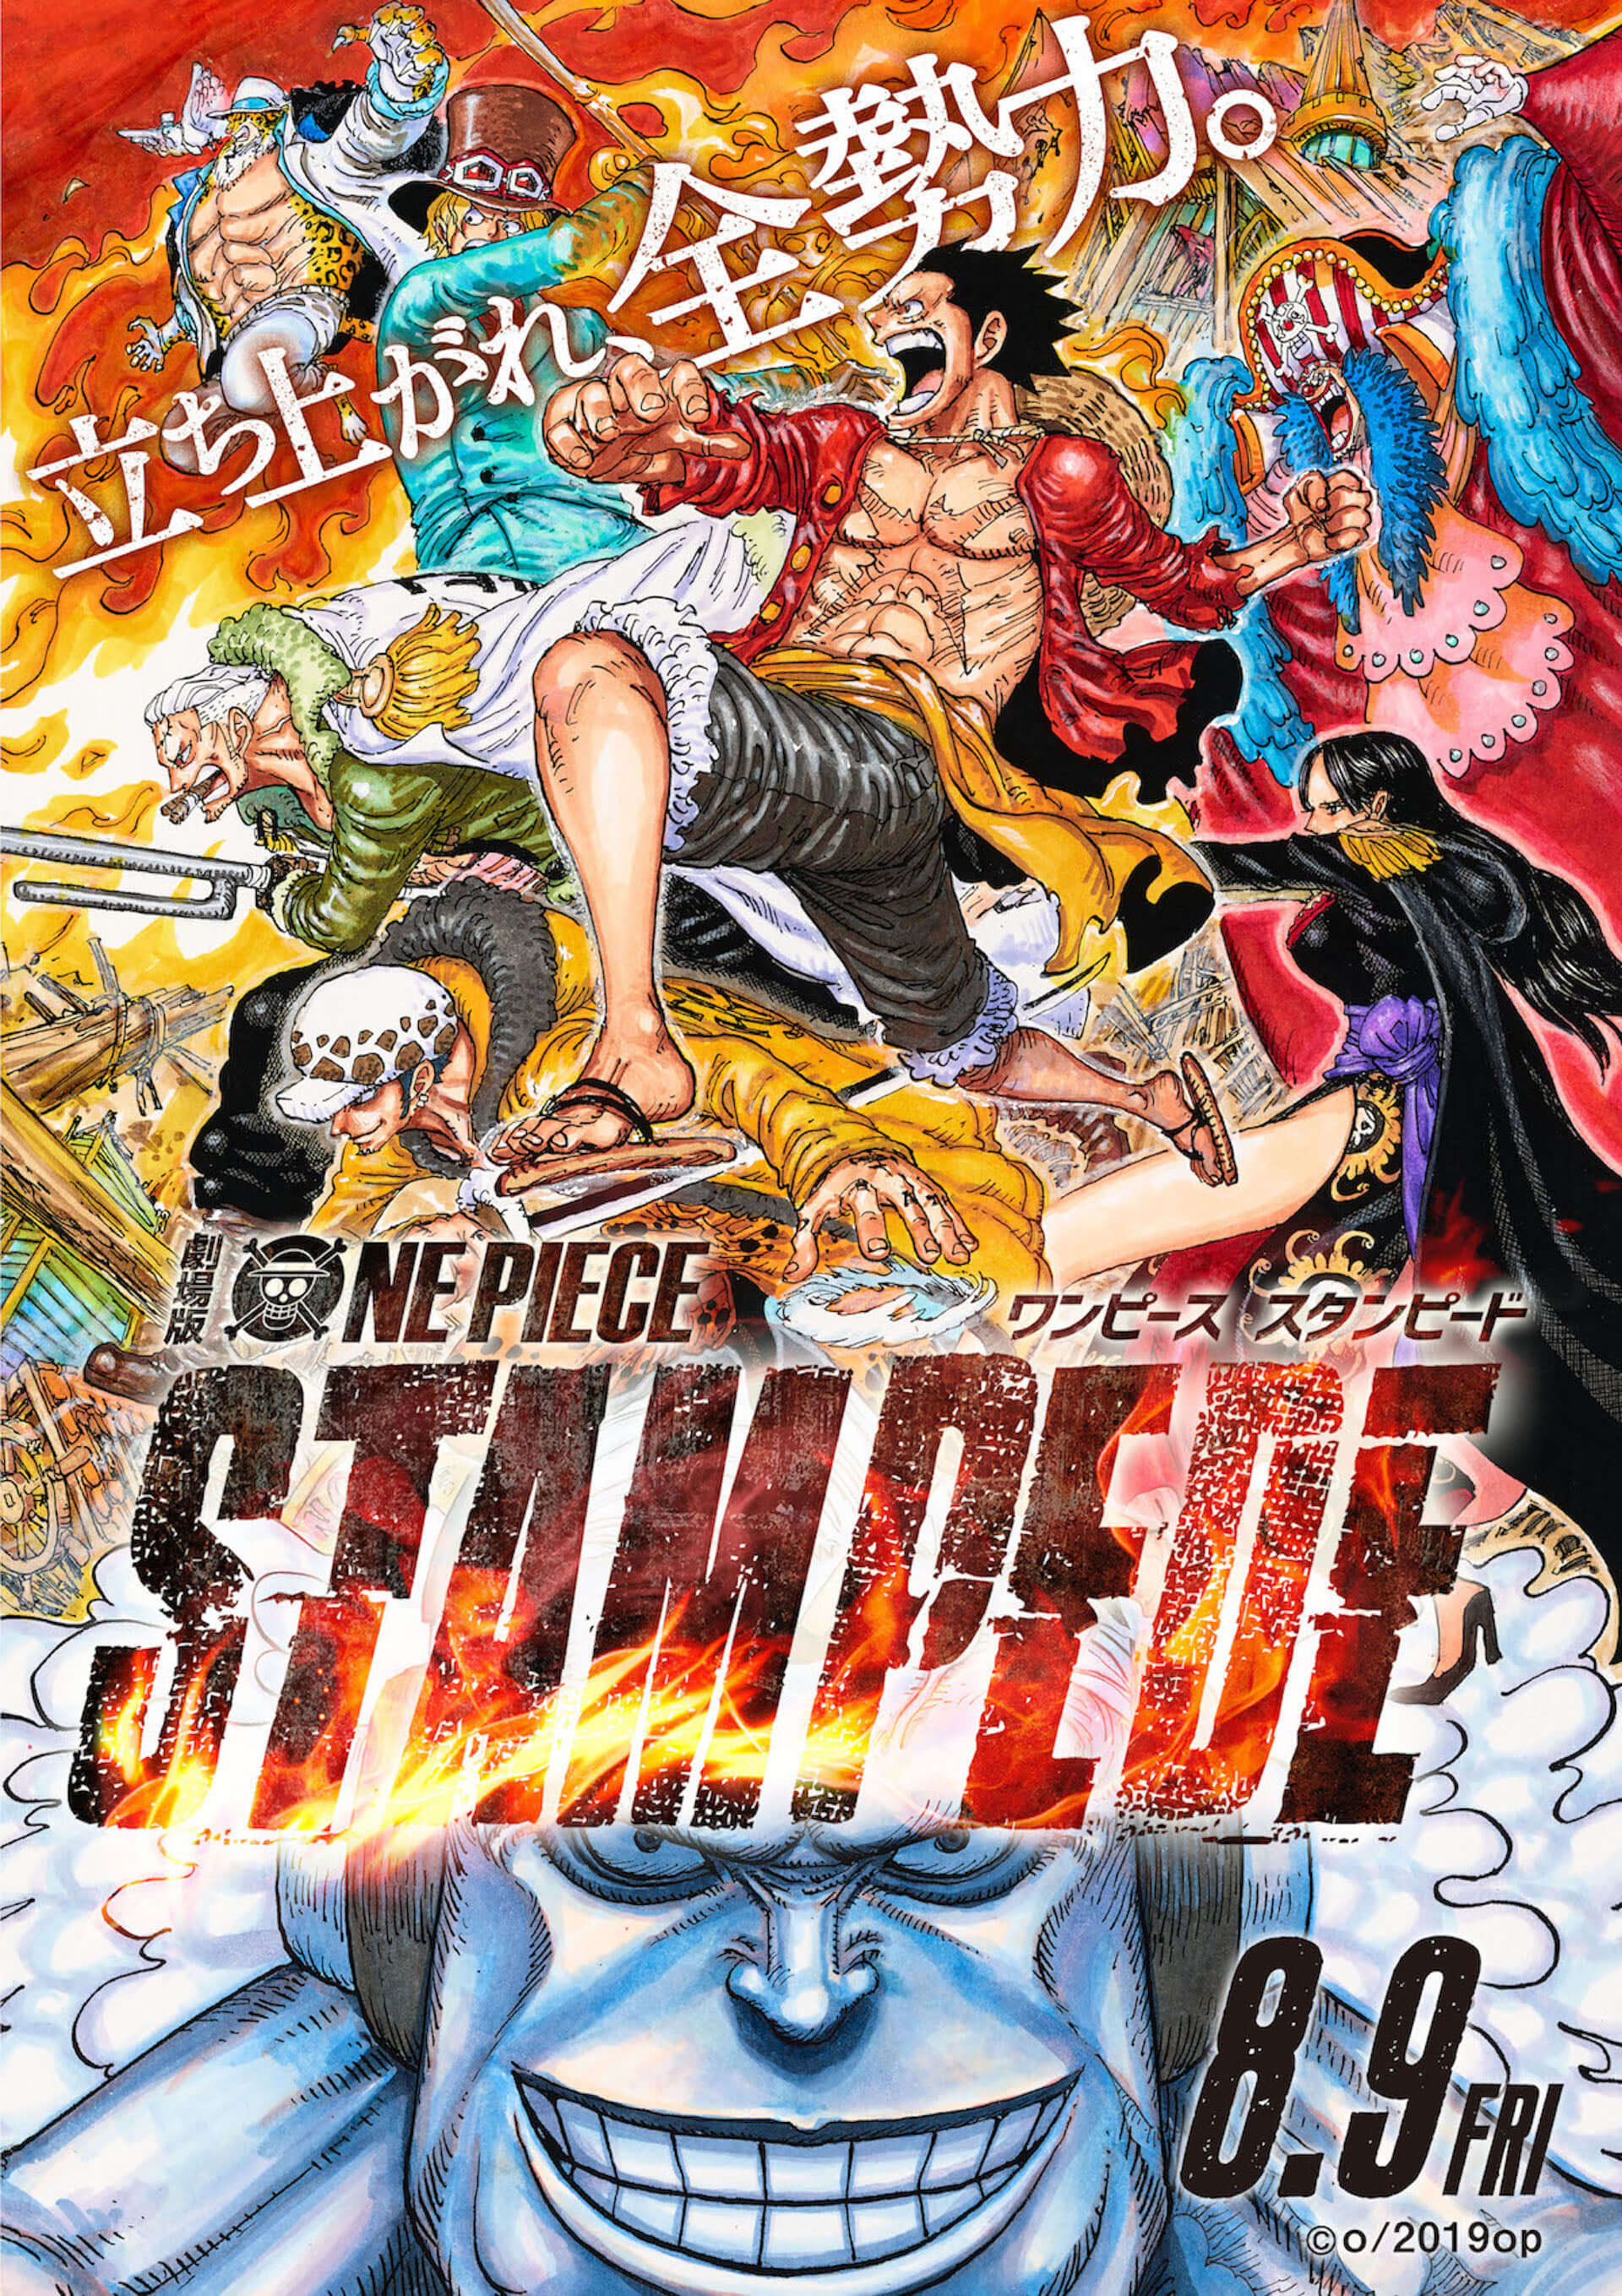 『ONE PIECE STAMPEDE』公開記念!TVアニメで映画連動特別編が放送決定|一部登場キャラクターも発表 film190723_onepiece_stampede_10-1920x2718